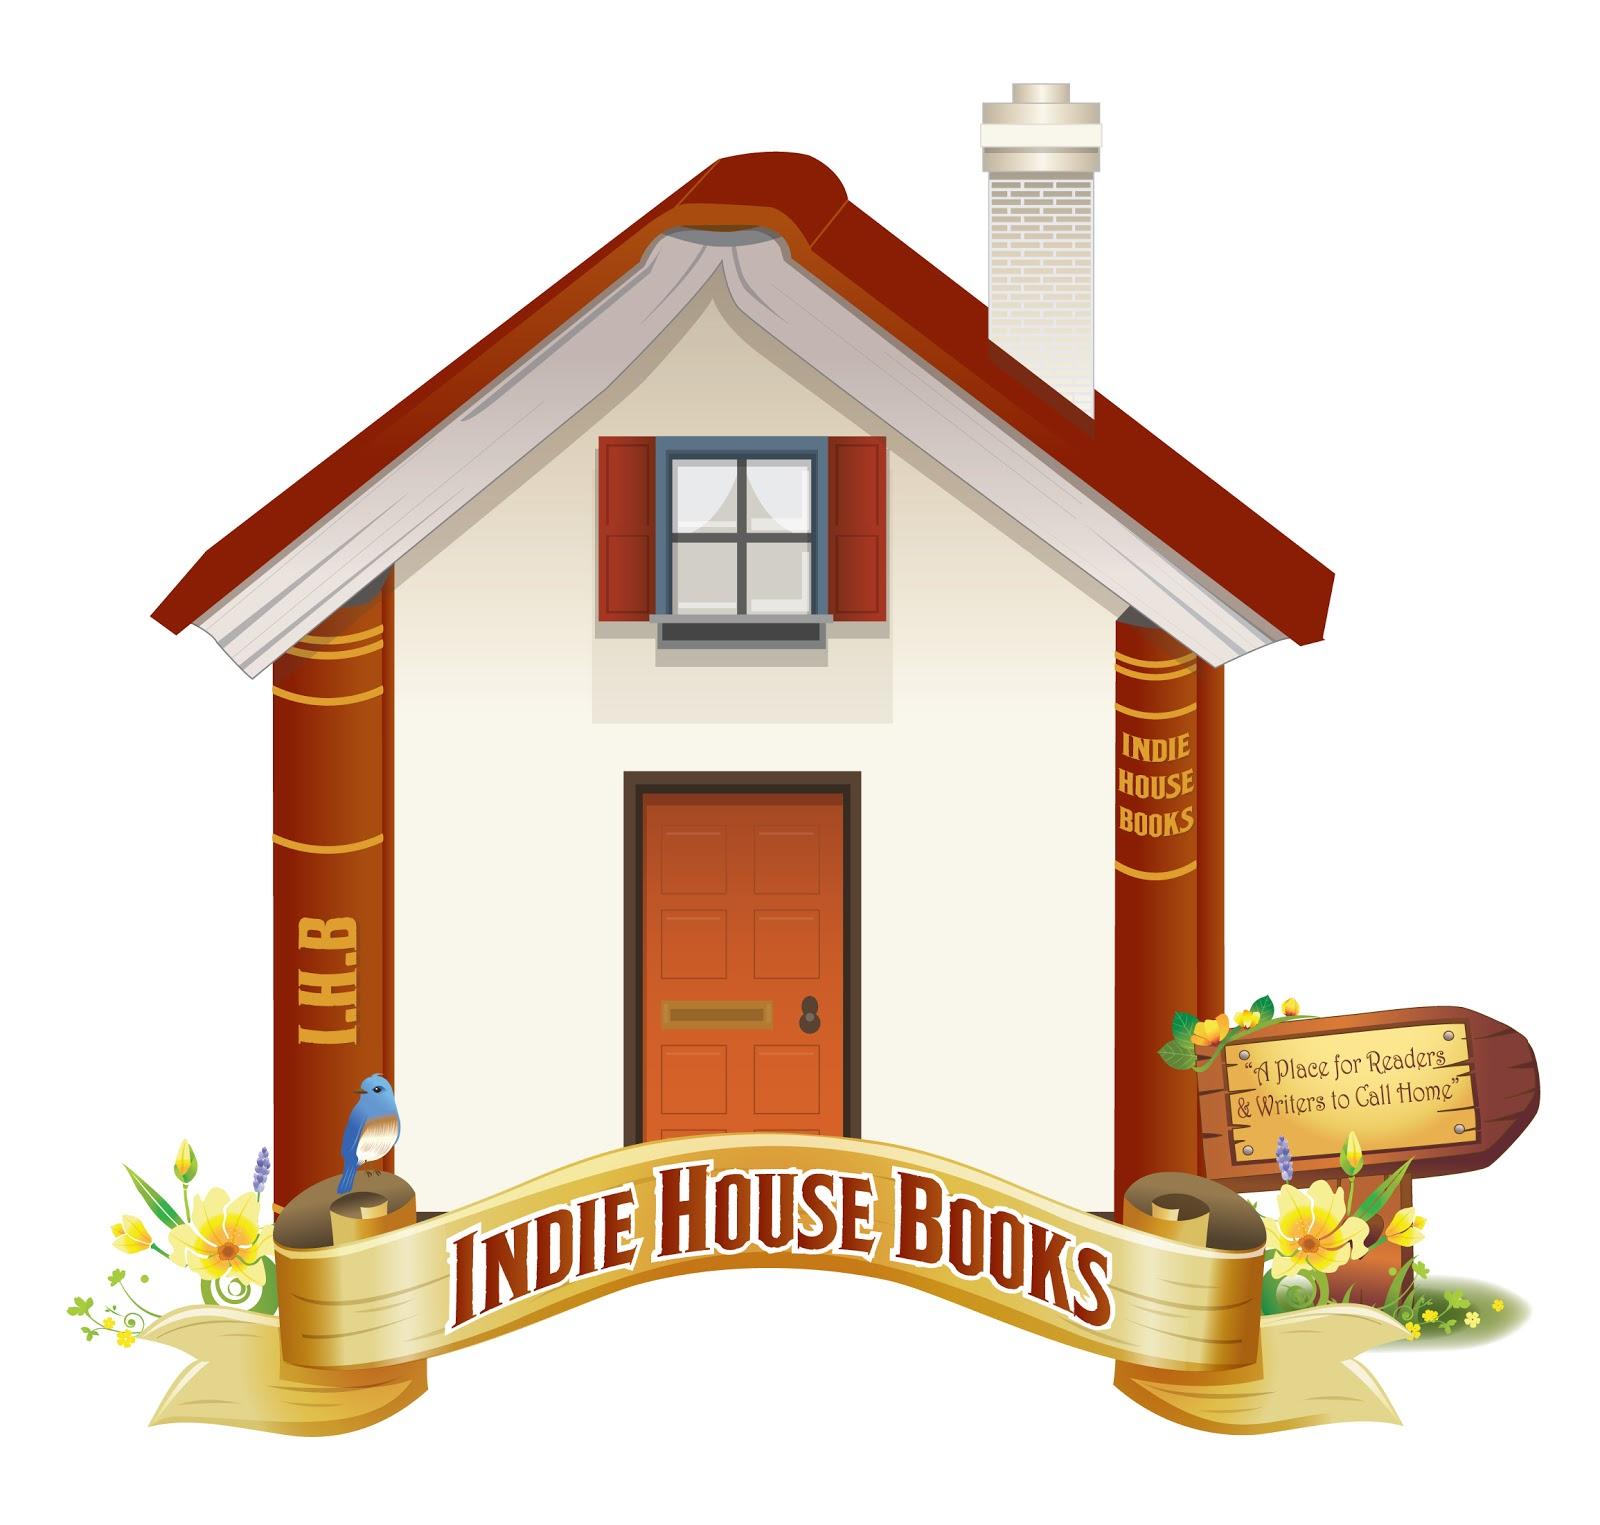 Bookish Indulgences: The King Series by Tawdra Kandle